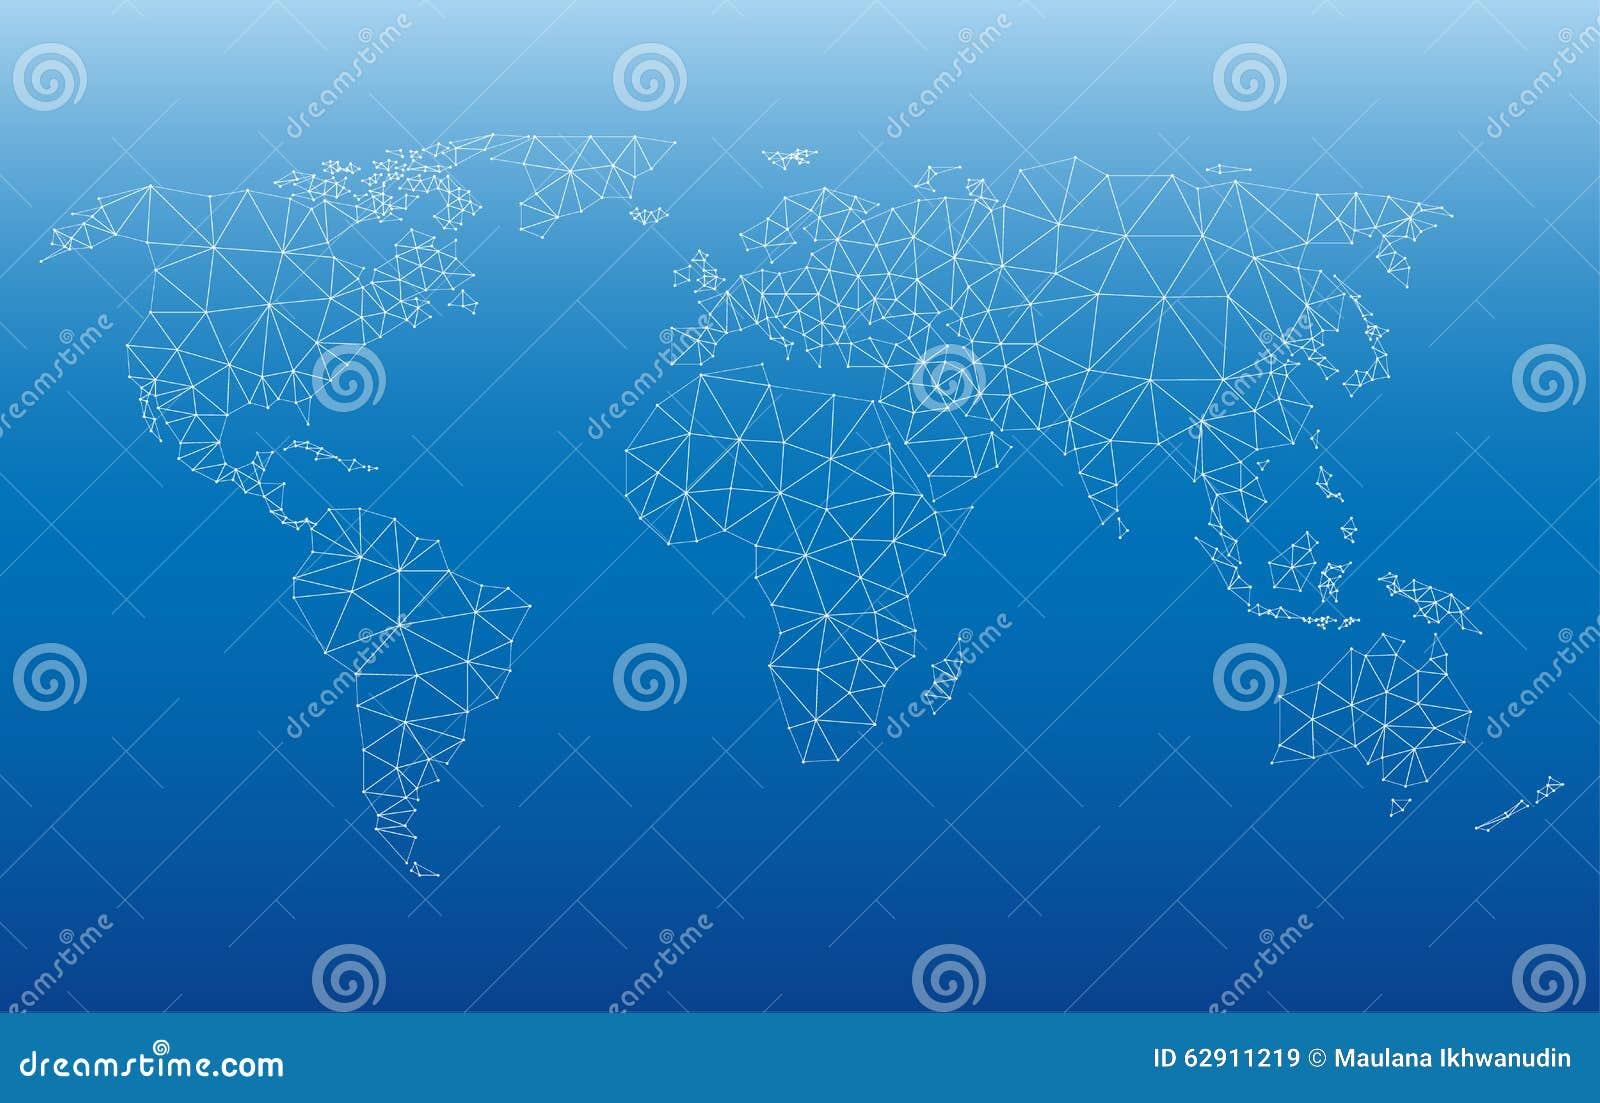 Unity Line Art Map : World map web stock vector image